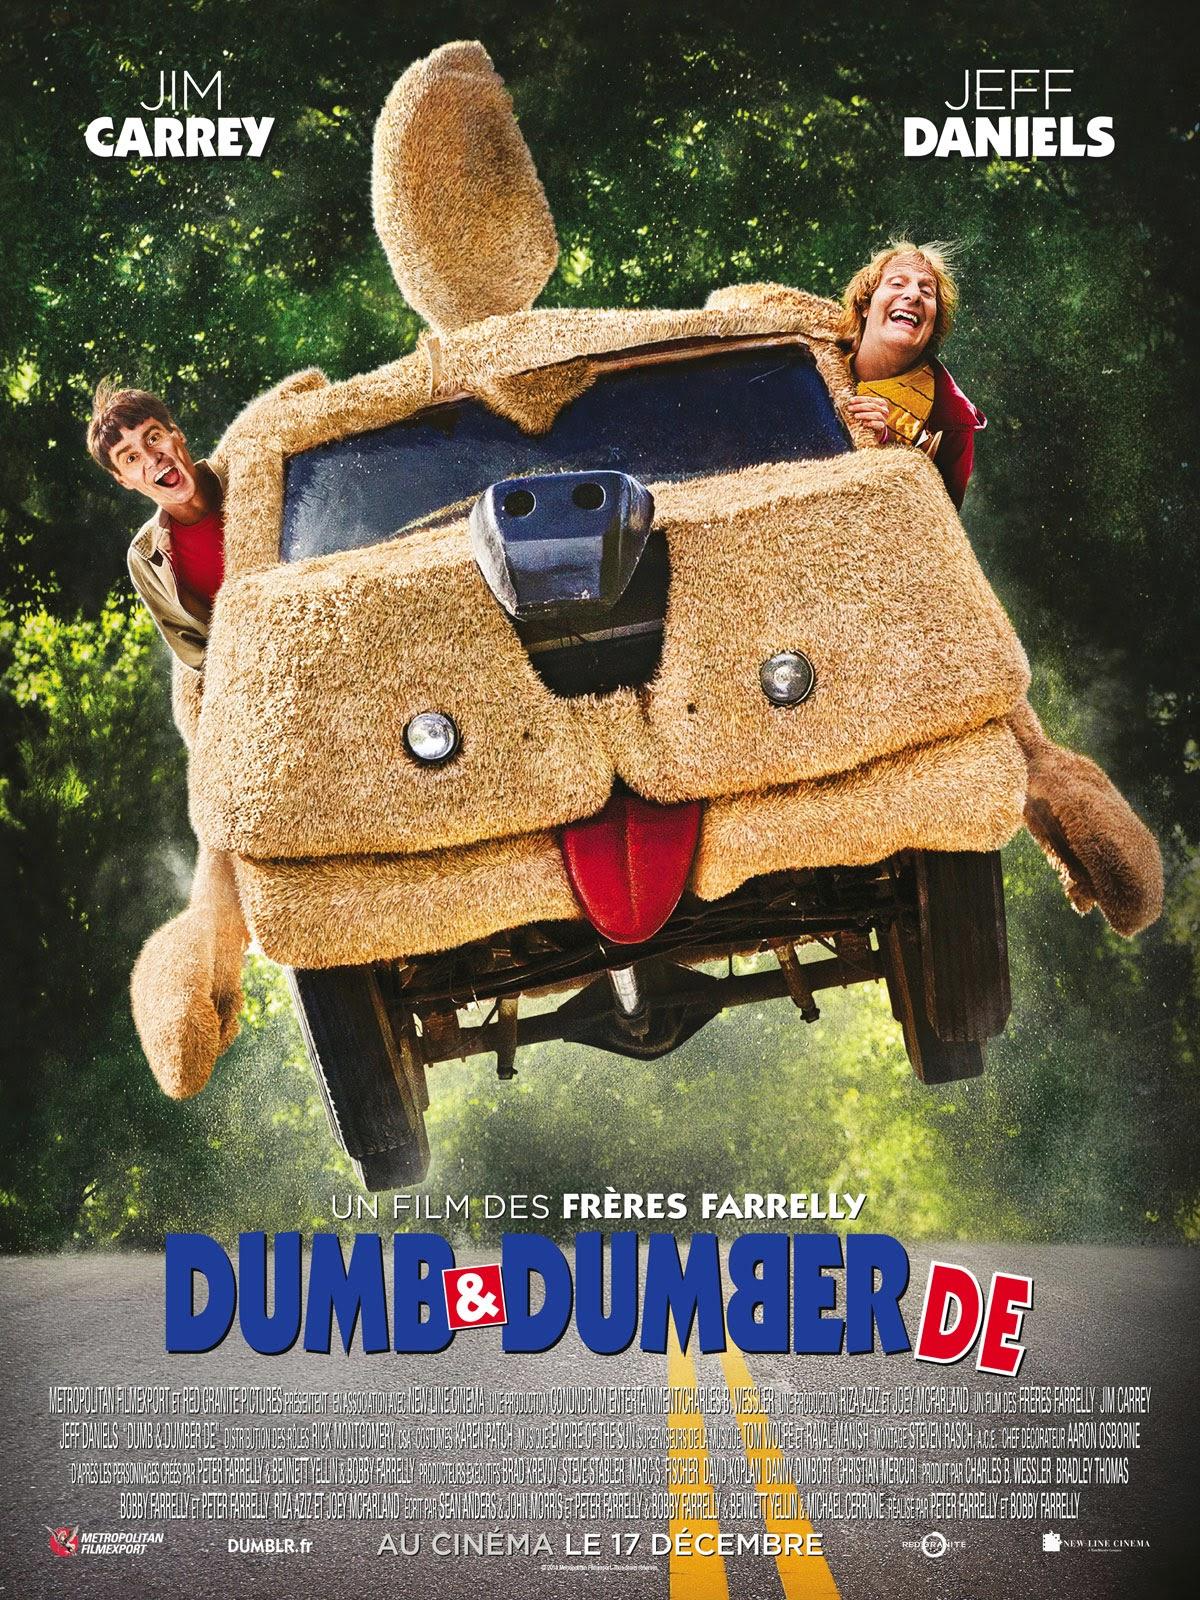 http://fuckingcinephiles.blogspot.fr/2014/12/critique-dumb-dumber-de.html